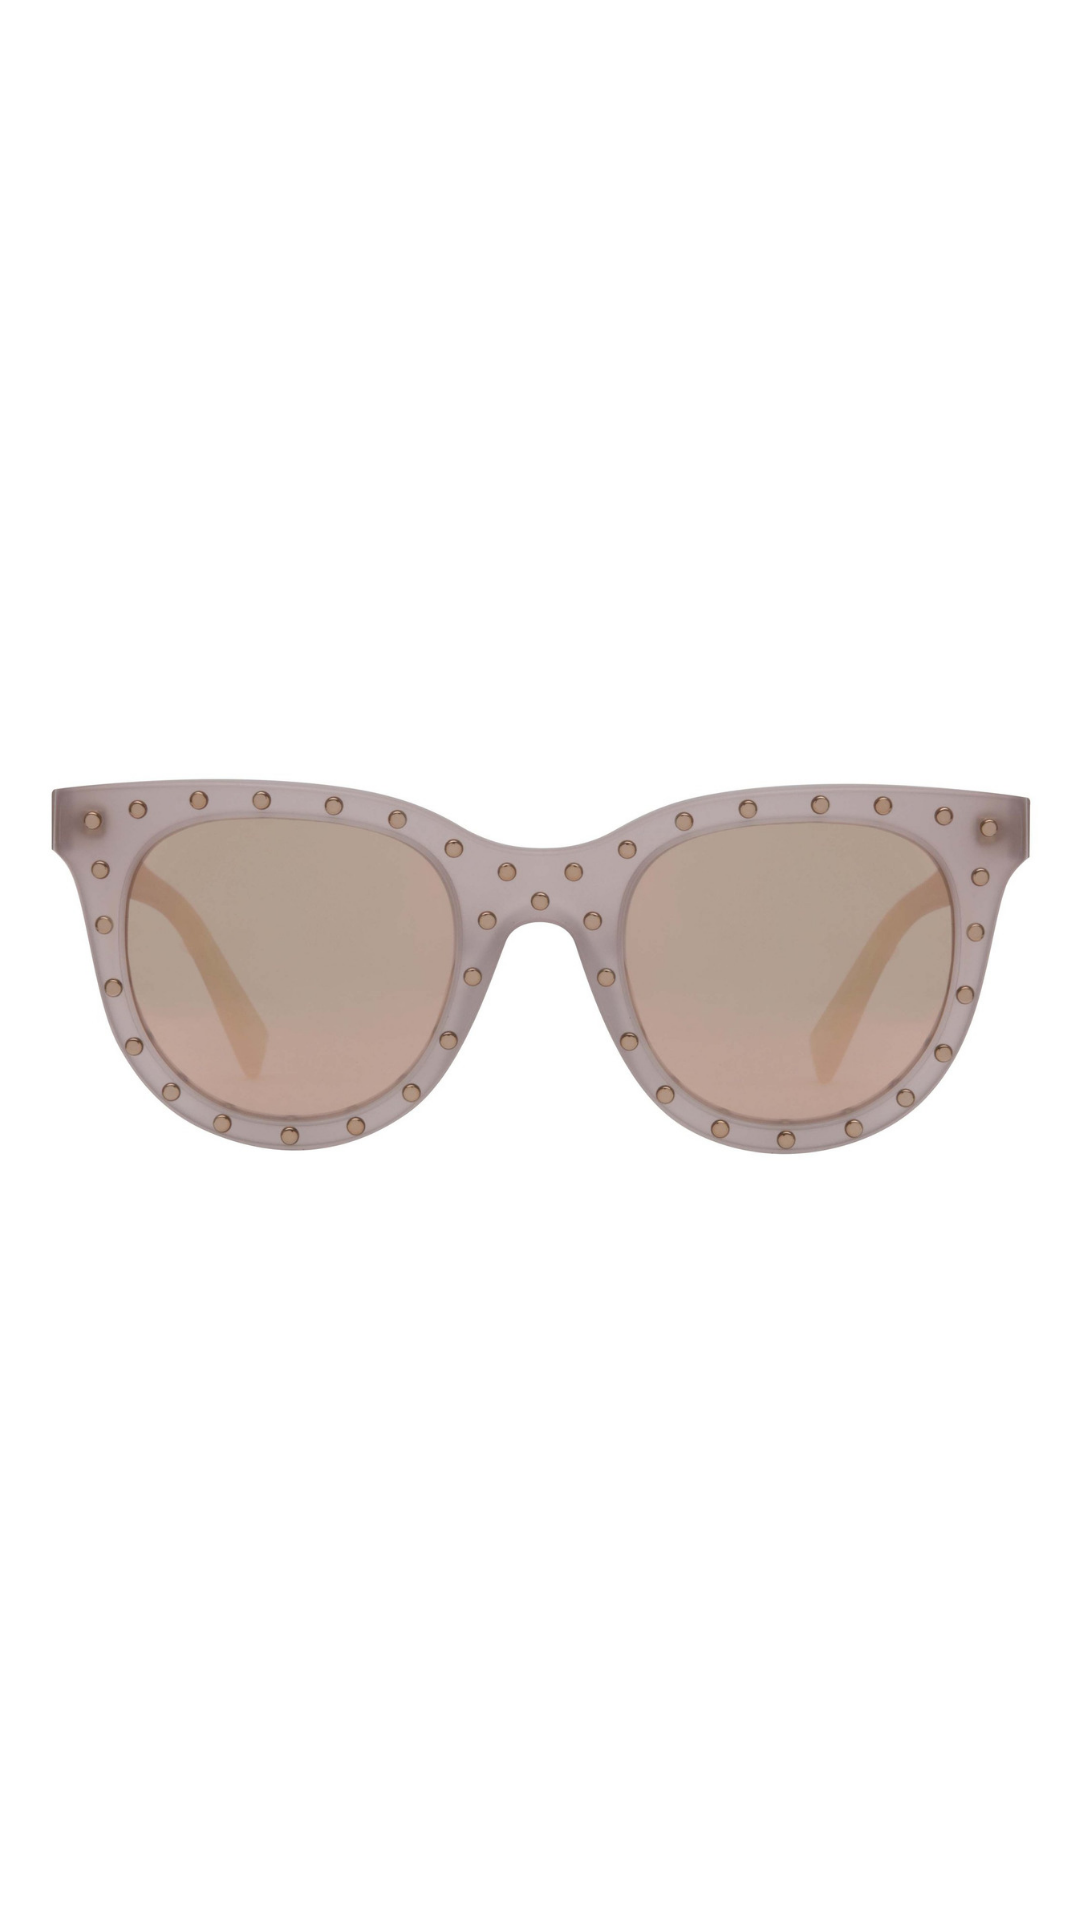 fd7595a5740 Cyndi Acetate Round Sunglasses